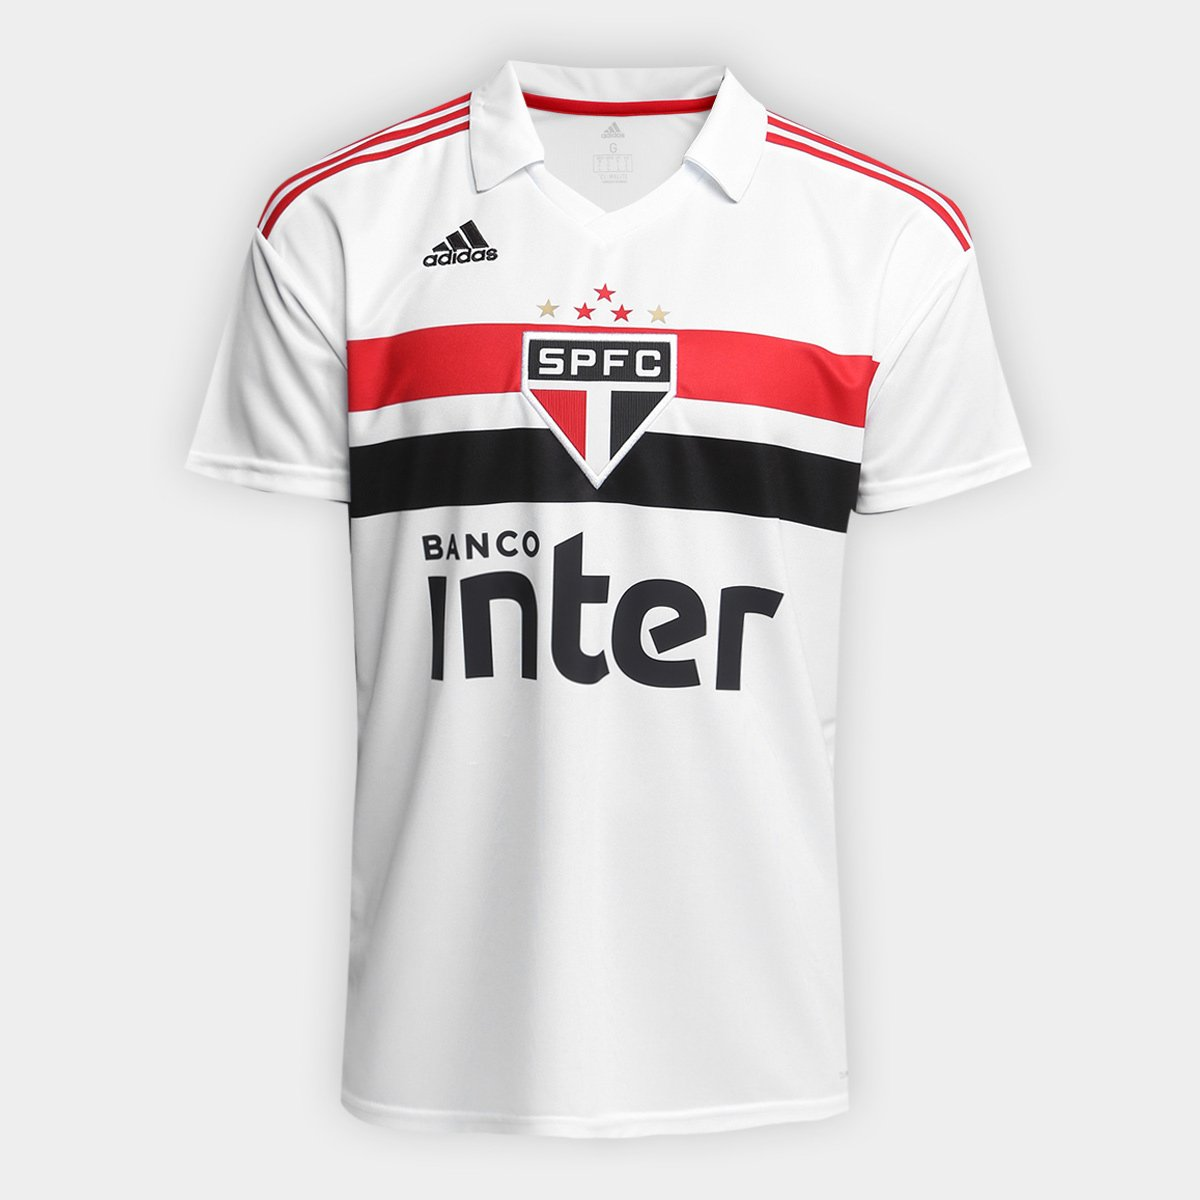 Camisa São Paulo I 2018 s n° Torcedor Adidas Masculina - Branco e ... 2bcd7c7096d8e